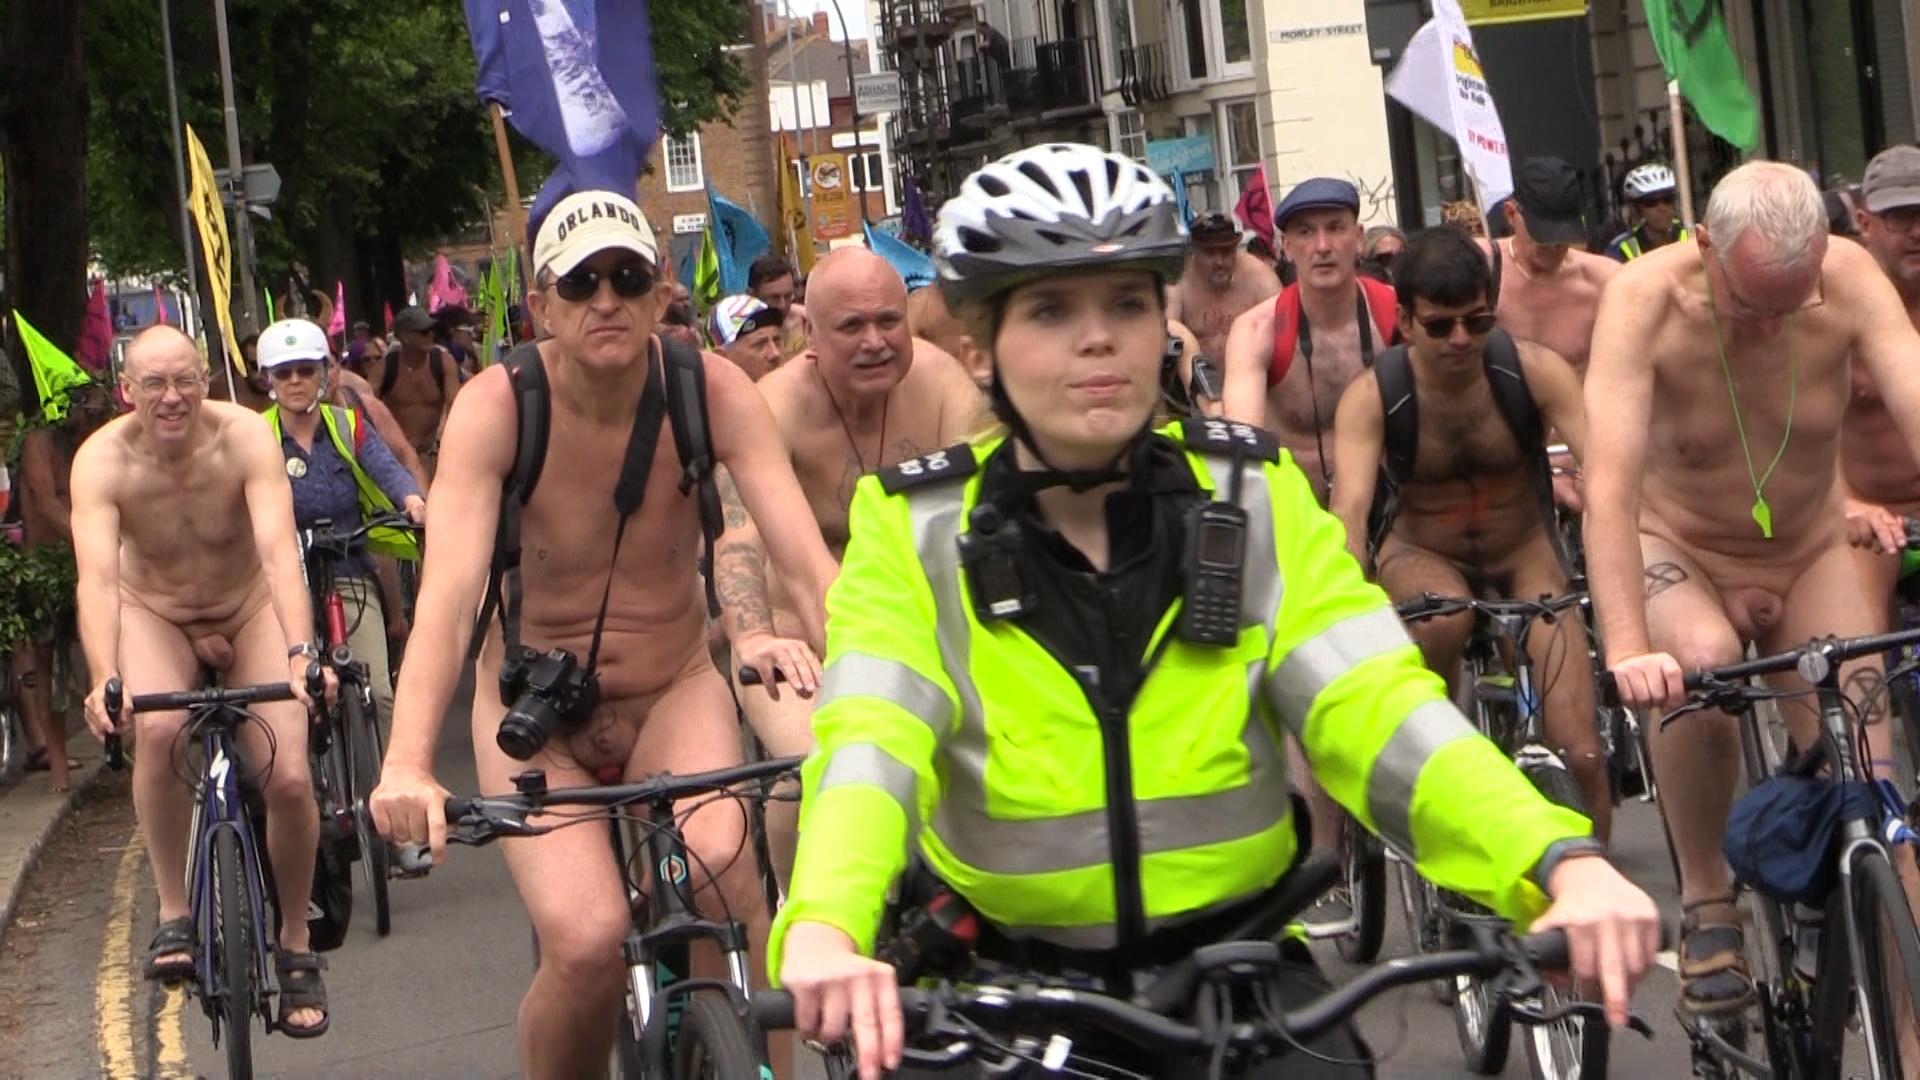 Outrage Over Brighton Bondage Bridal Fair